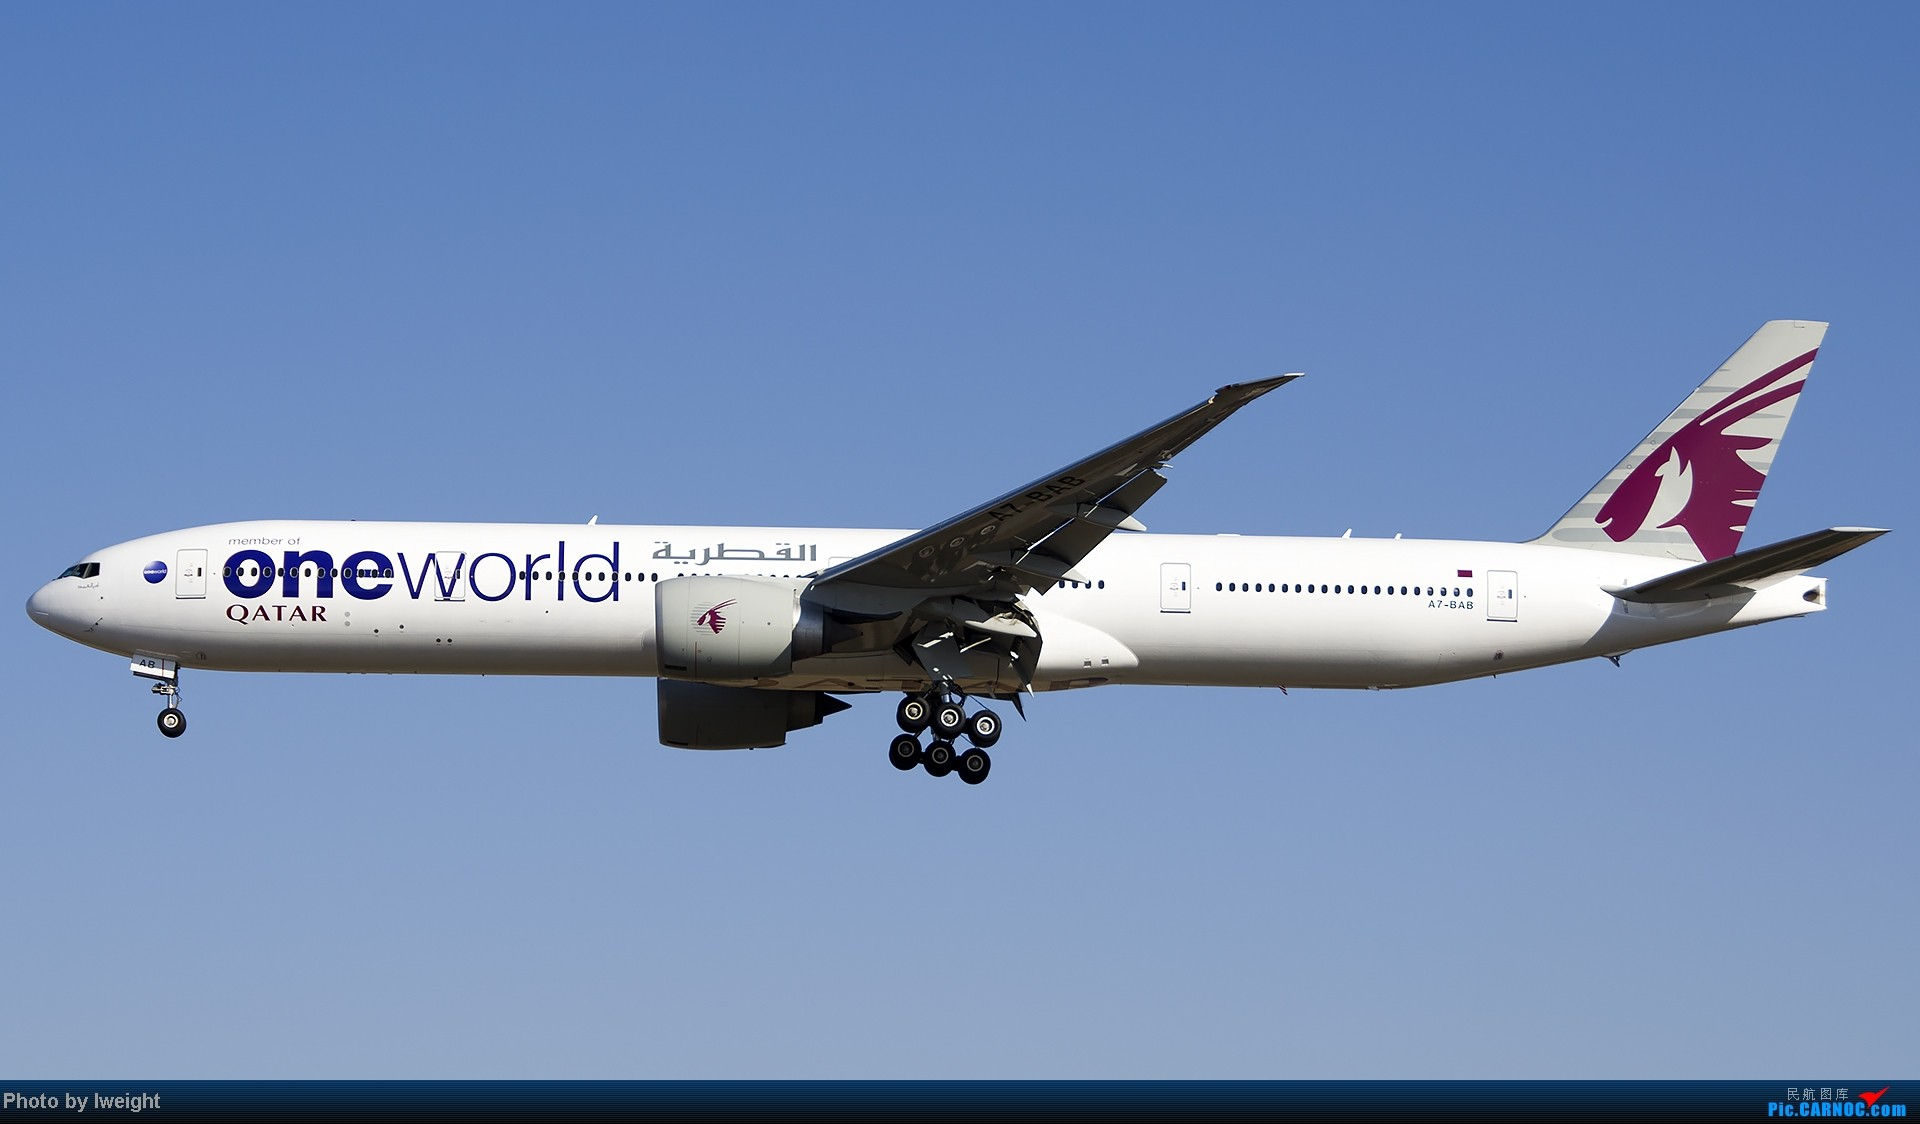 Re:[原创]抓住APEC蓝的尾巴,再拍上一组 BOEING 777-300ER A7-BAB 中国北京首都机场